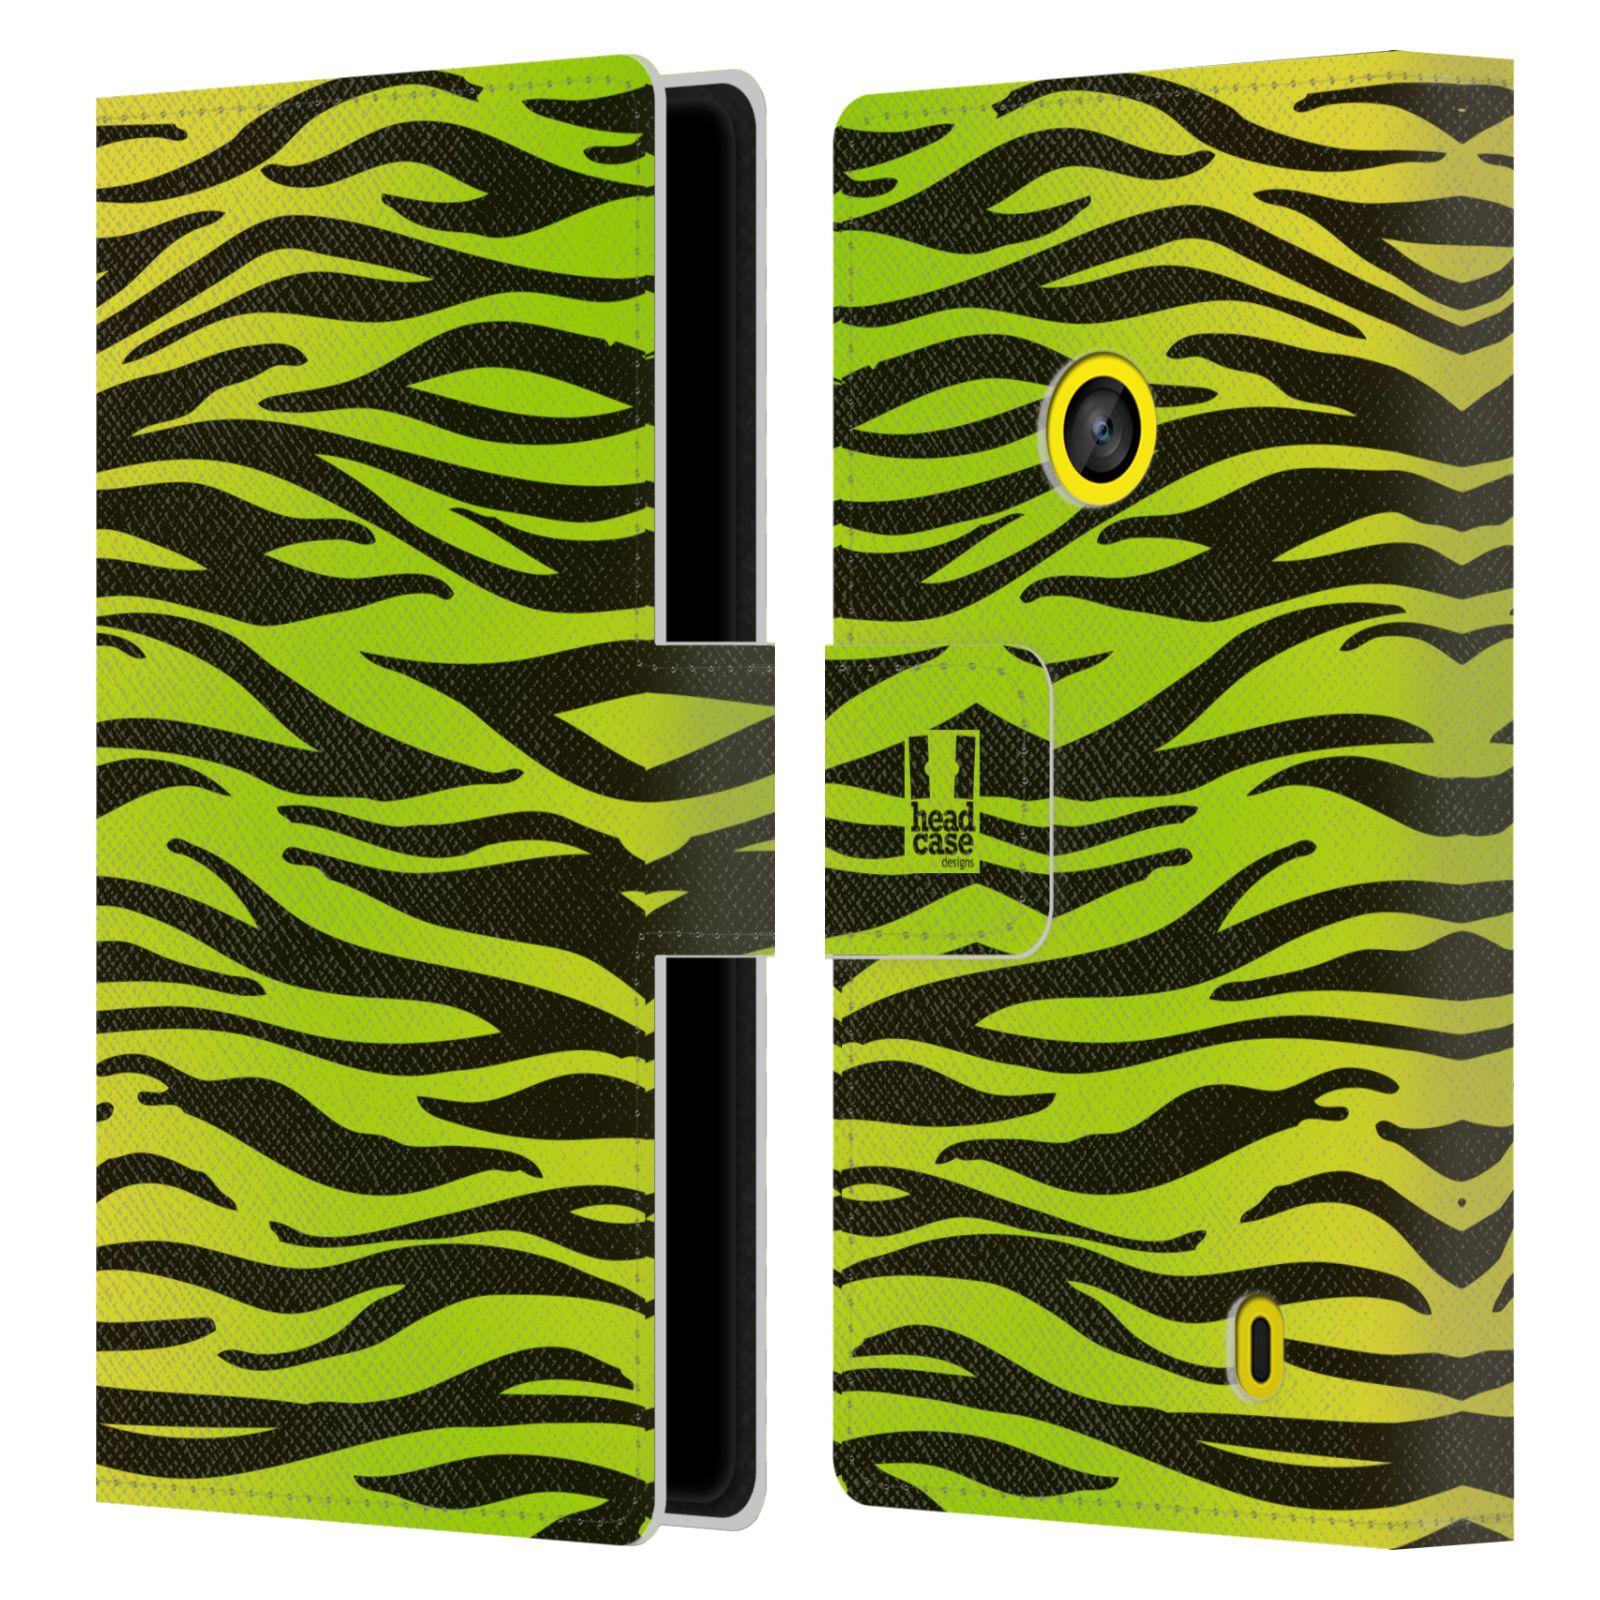 HEAD CASE Flipové pouzdro pro mobil NOKIA LUMIA 520 / 525 Zvířecí barevné vzory žlutozelená zebra